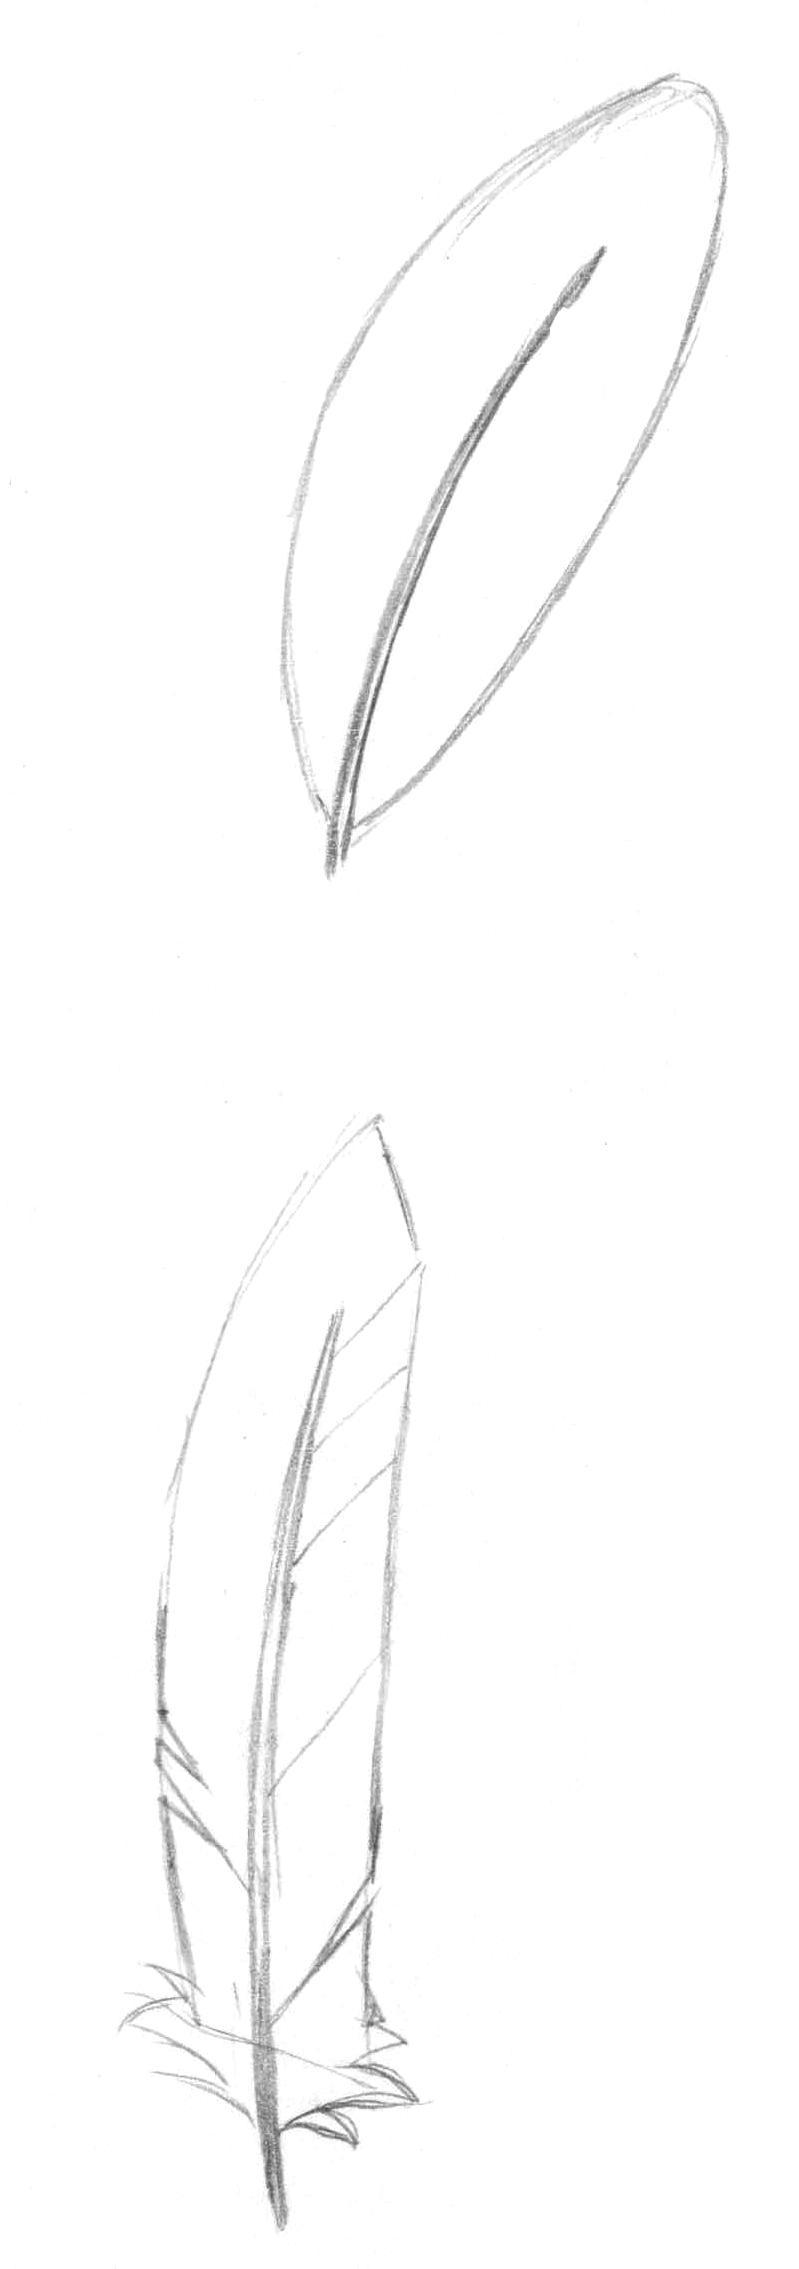 Рисуем перья карандашом - шаг 4